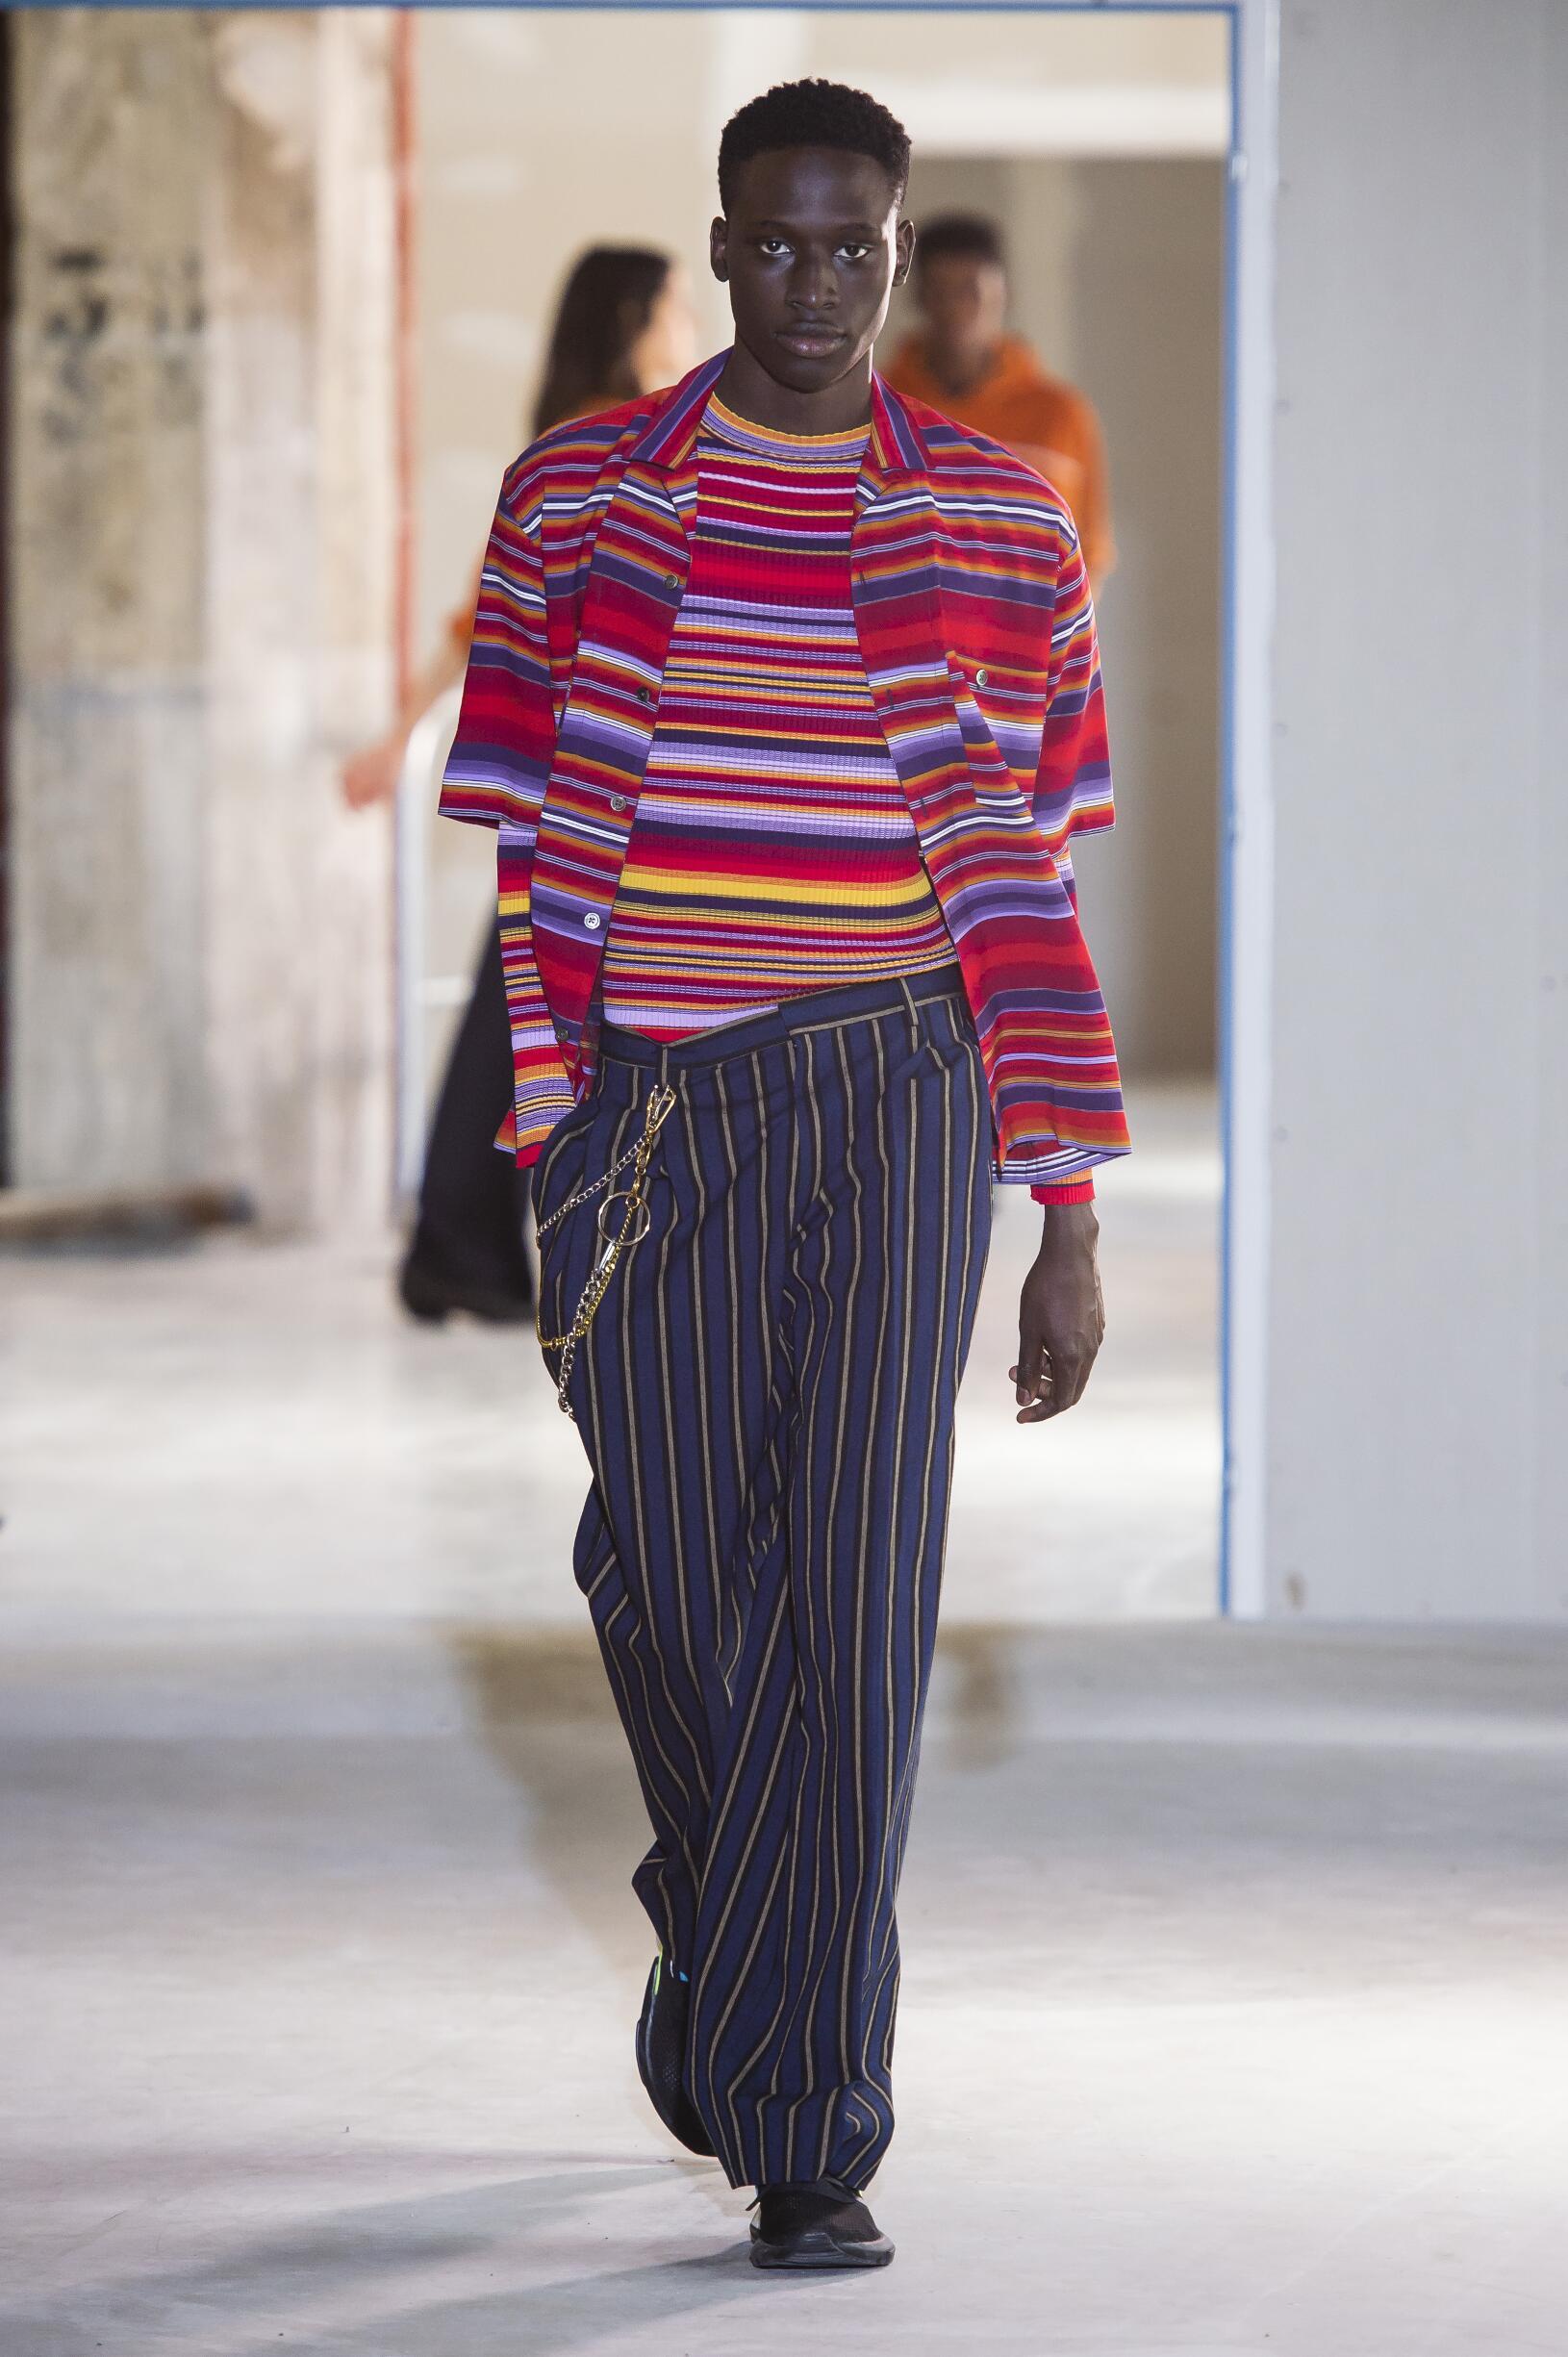 Catwalk Études Man Fashion Show Summer 2019